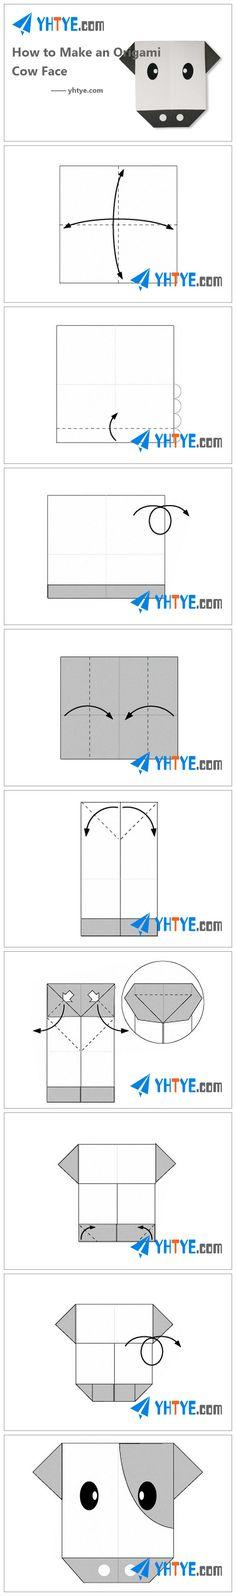 Contact us at Origami-Instructions.com | 1596x236